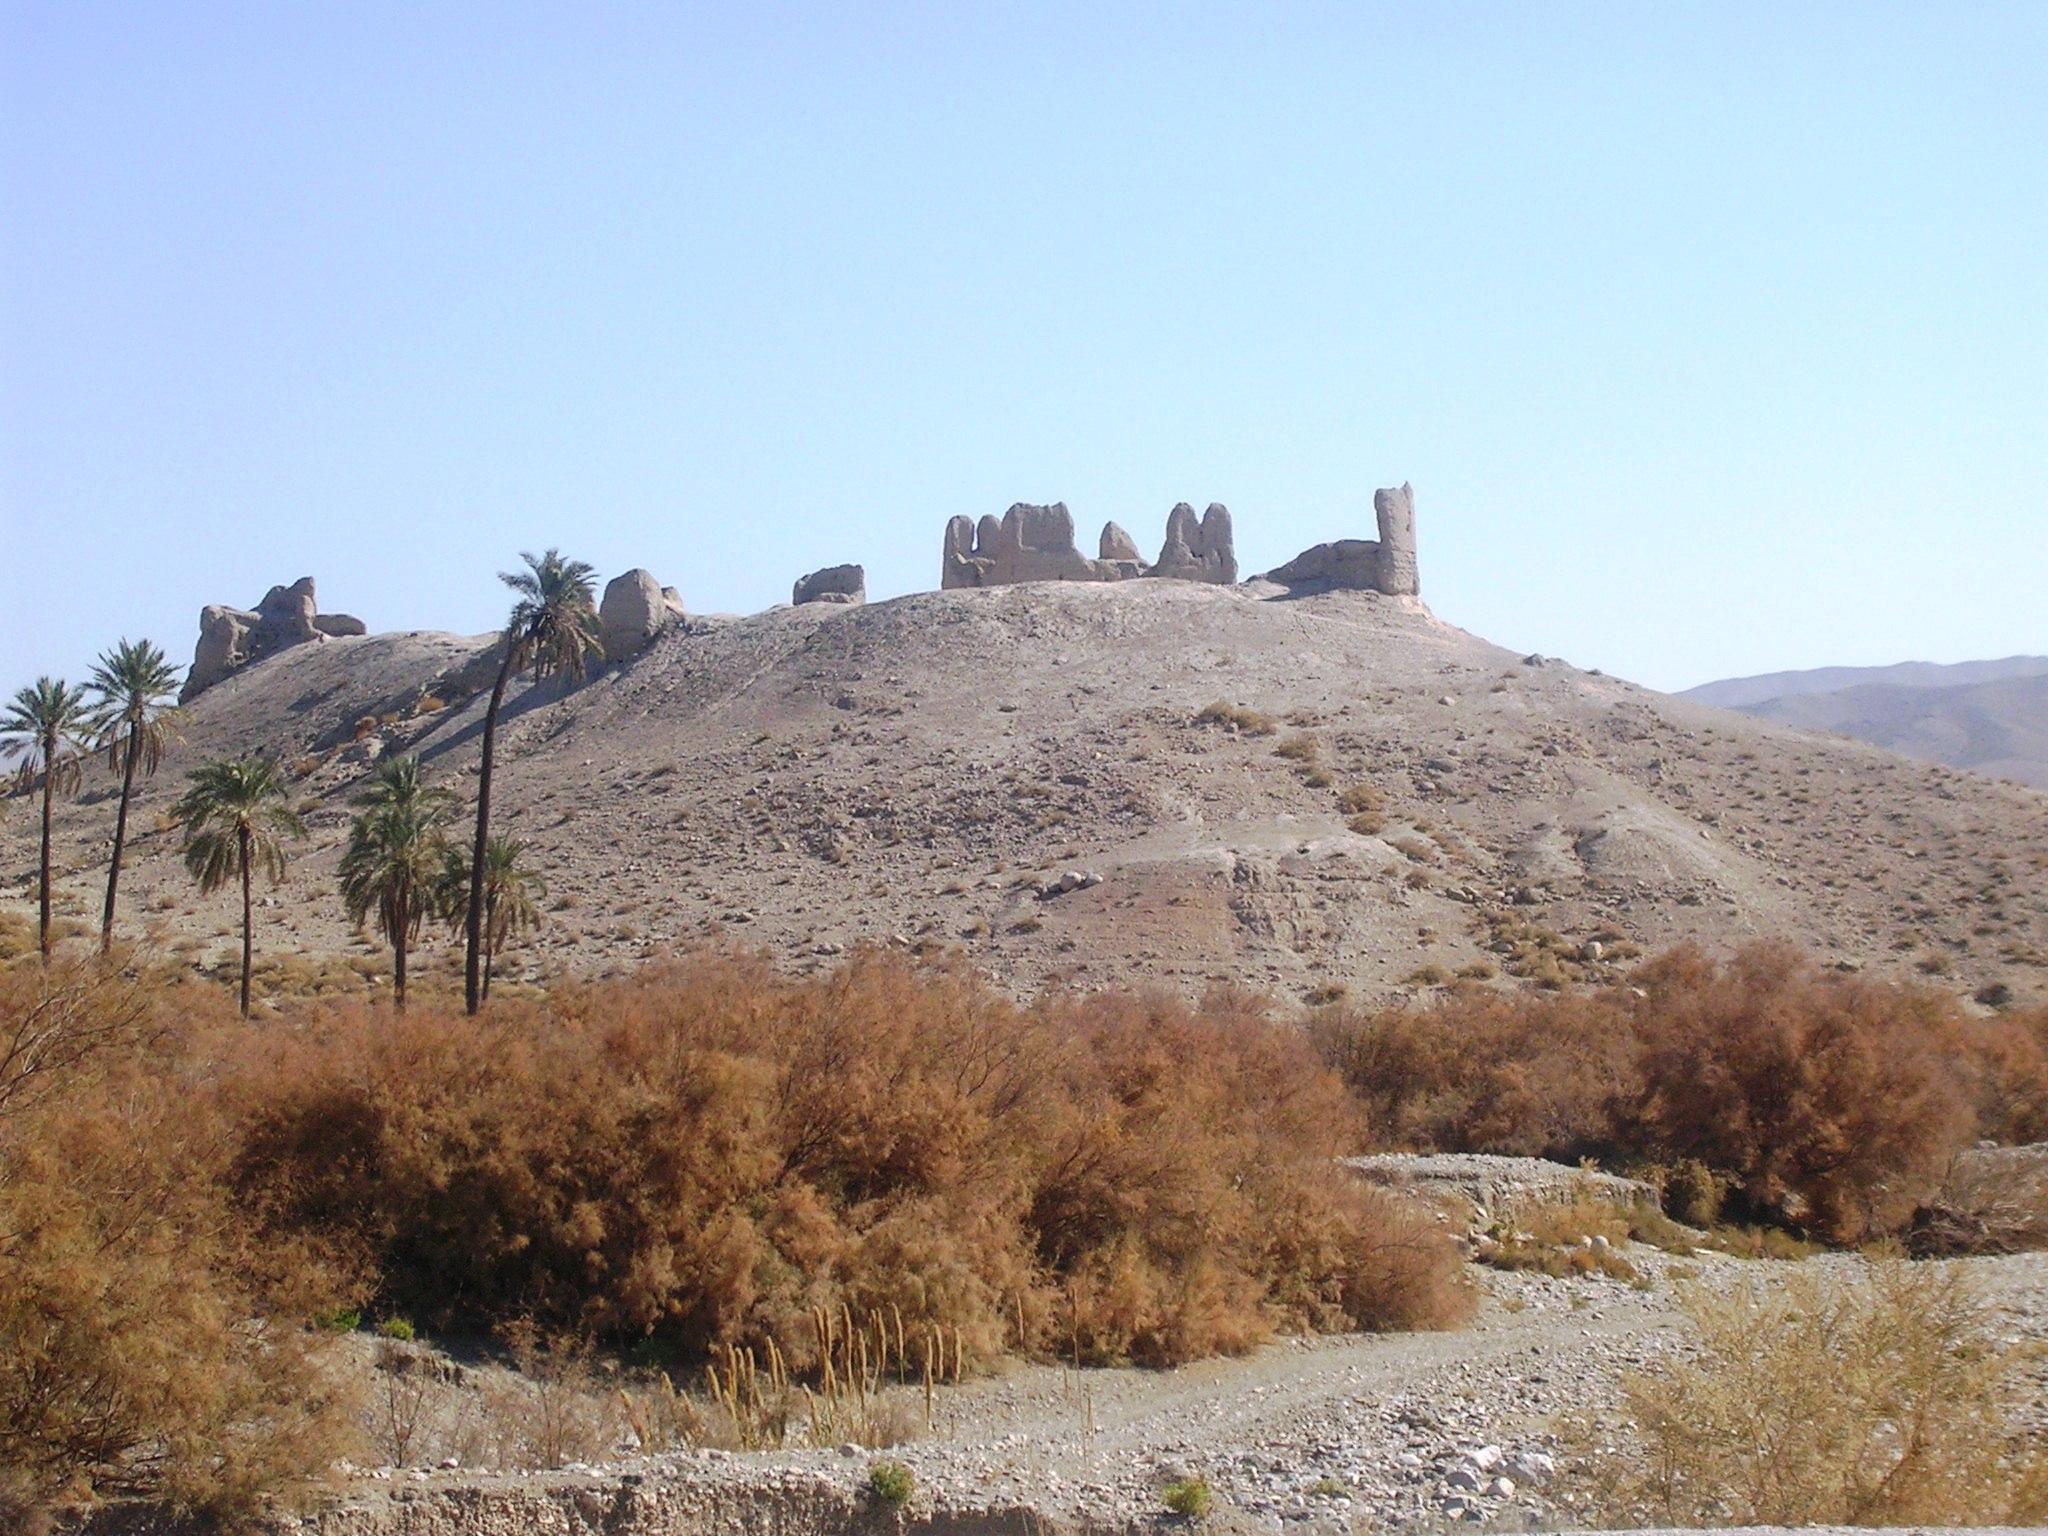 قلعه علی خان نصیرخان حاجی آباد